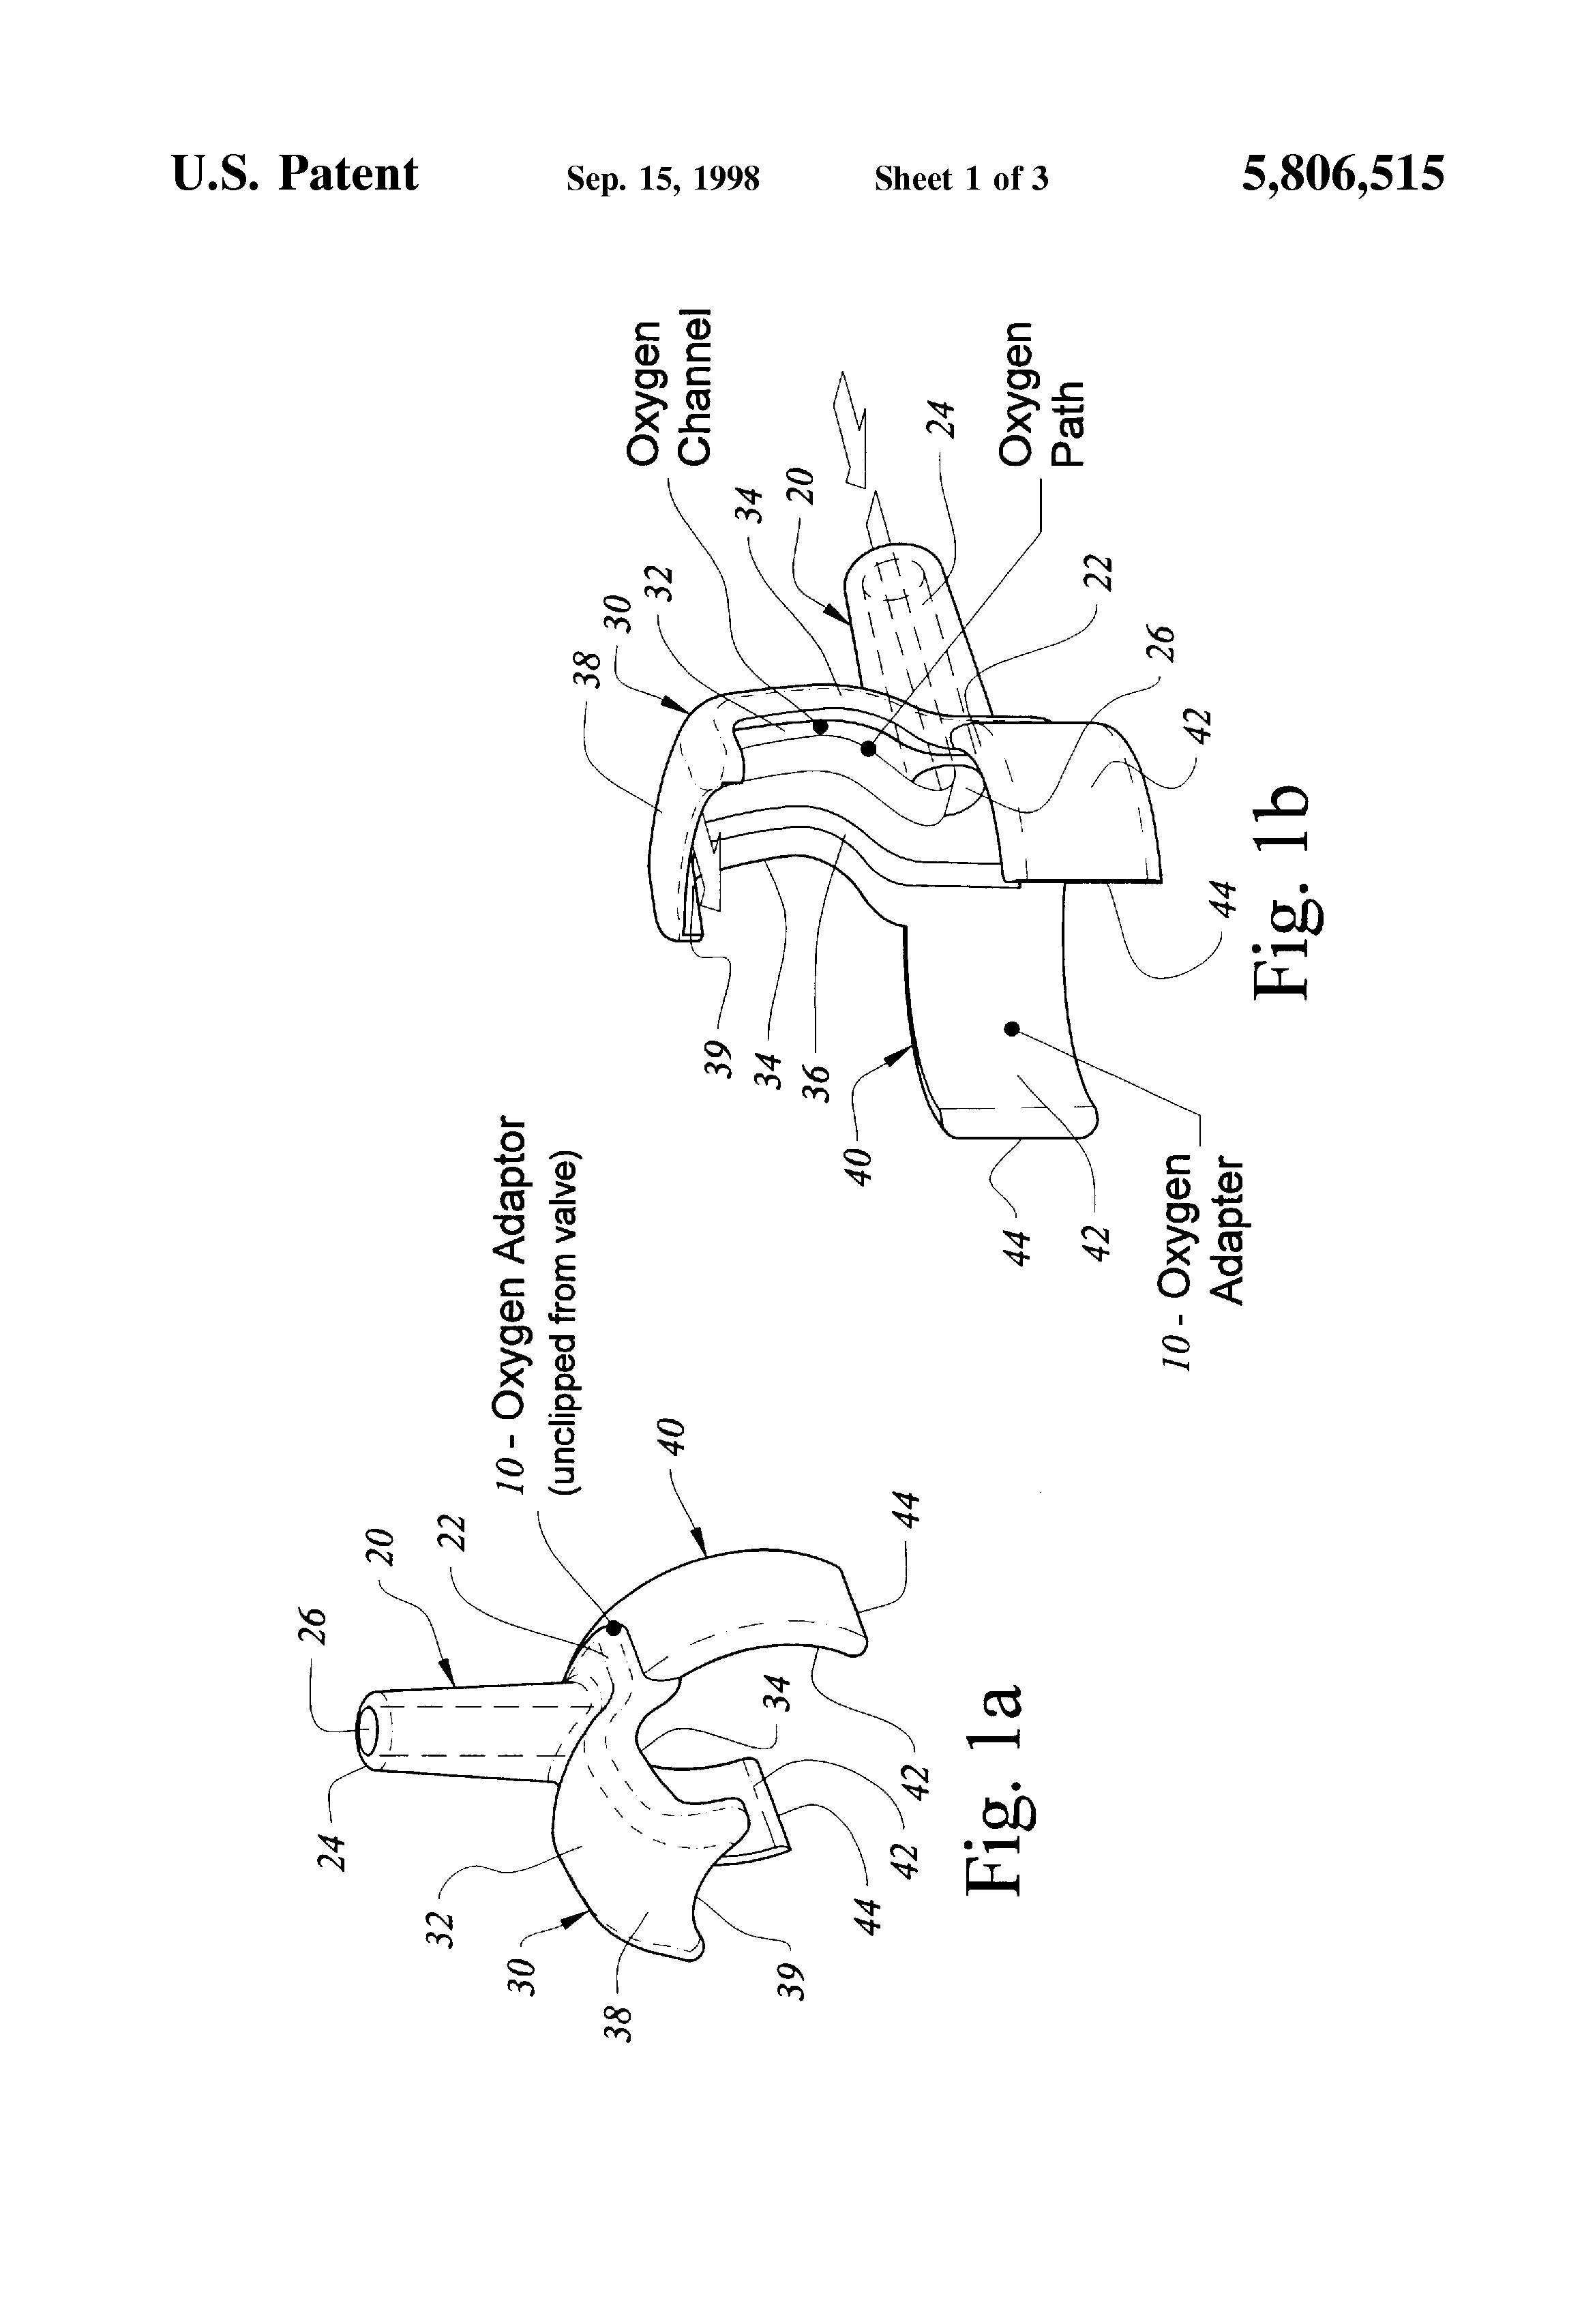 patente us5806515 - supplemental oxygen adapter for tracheostomy speaking valves